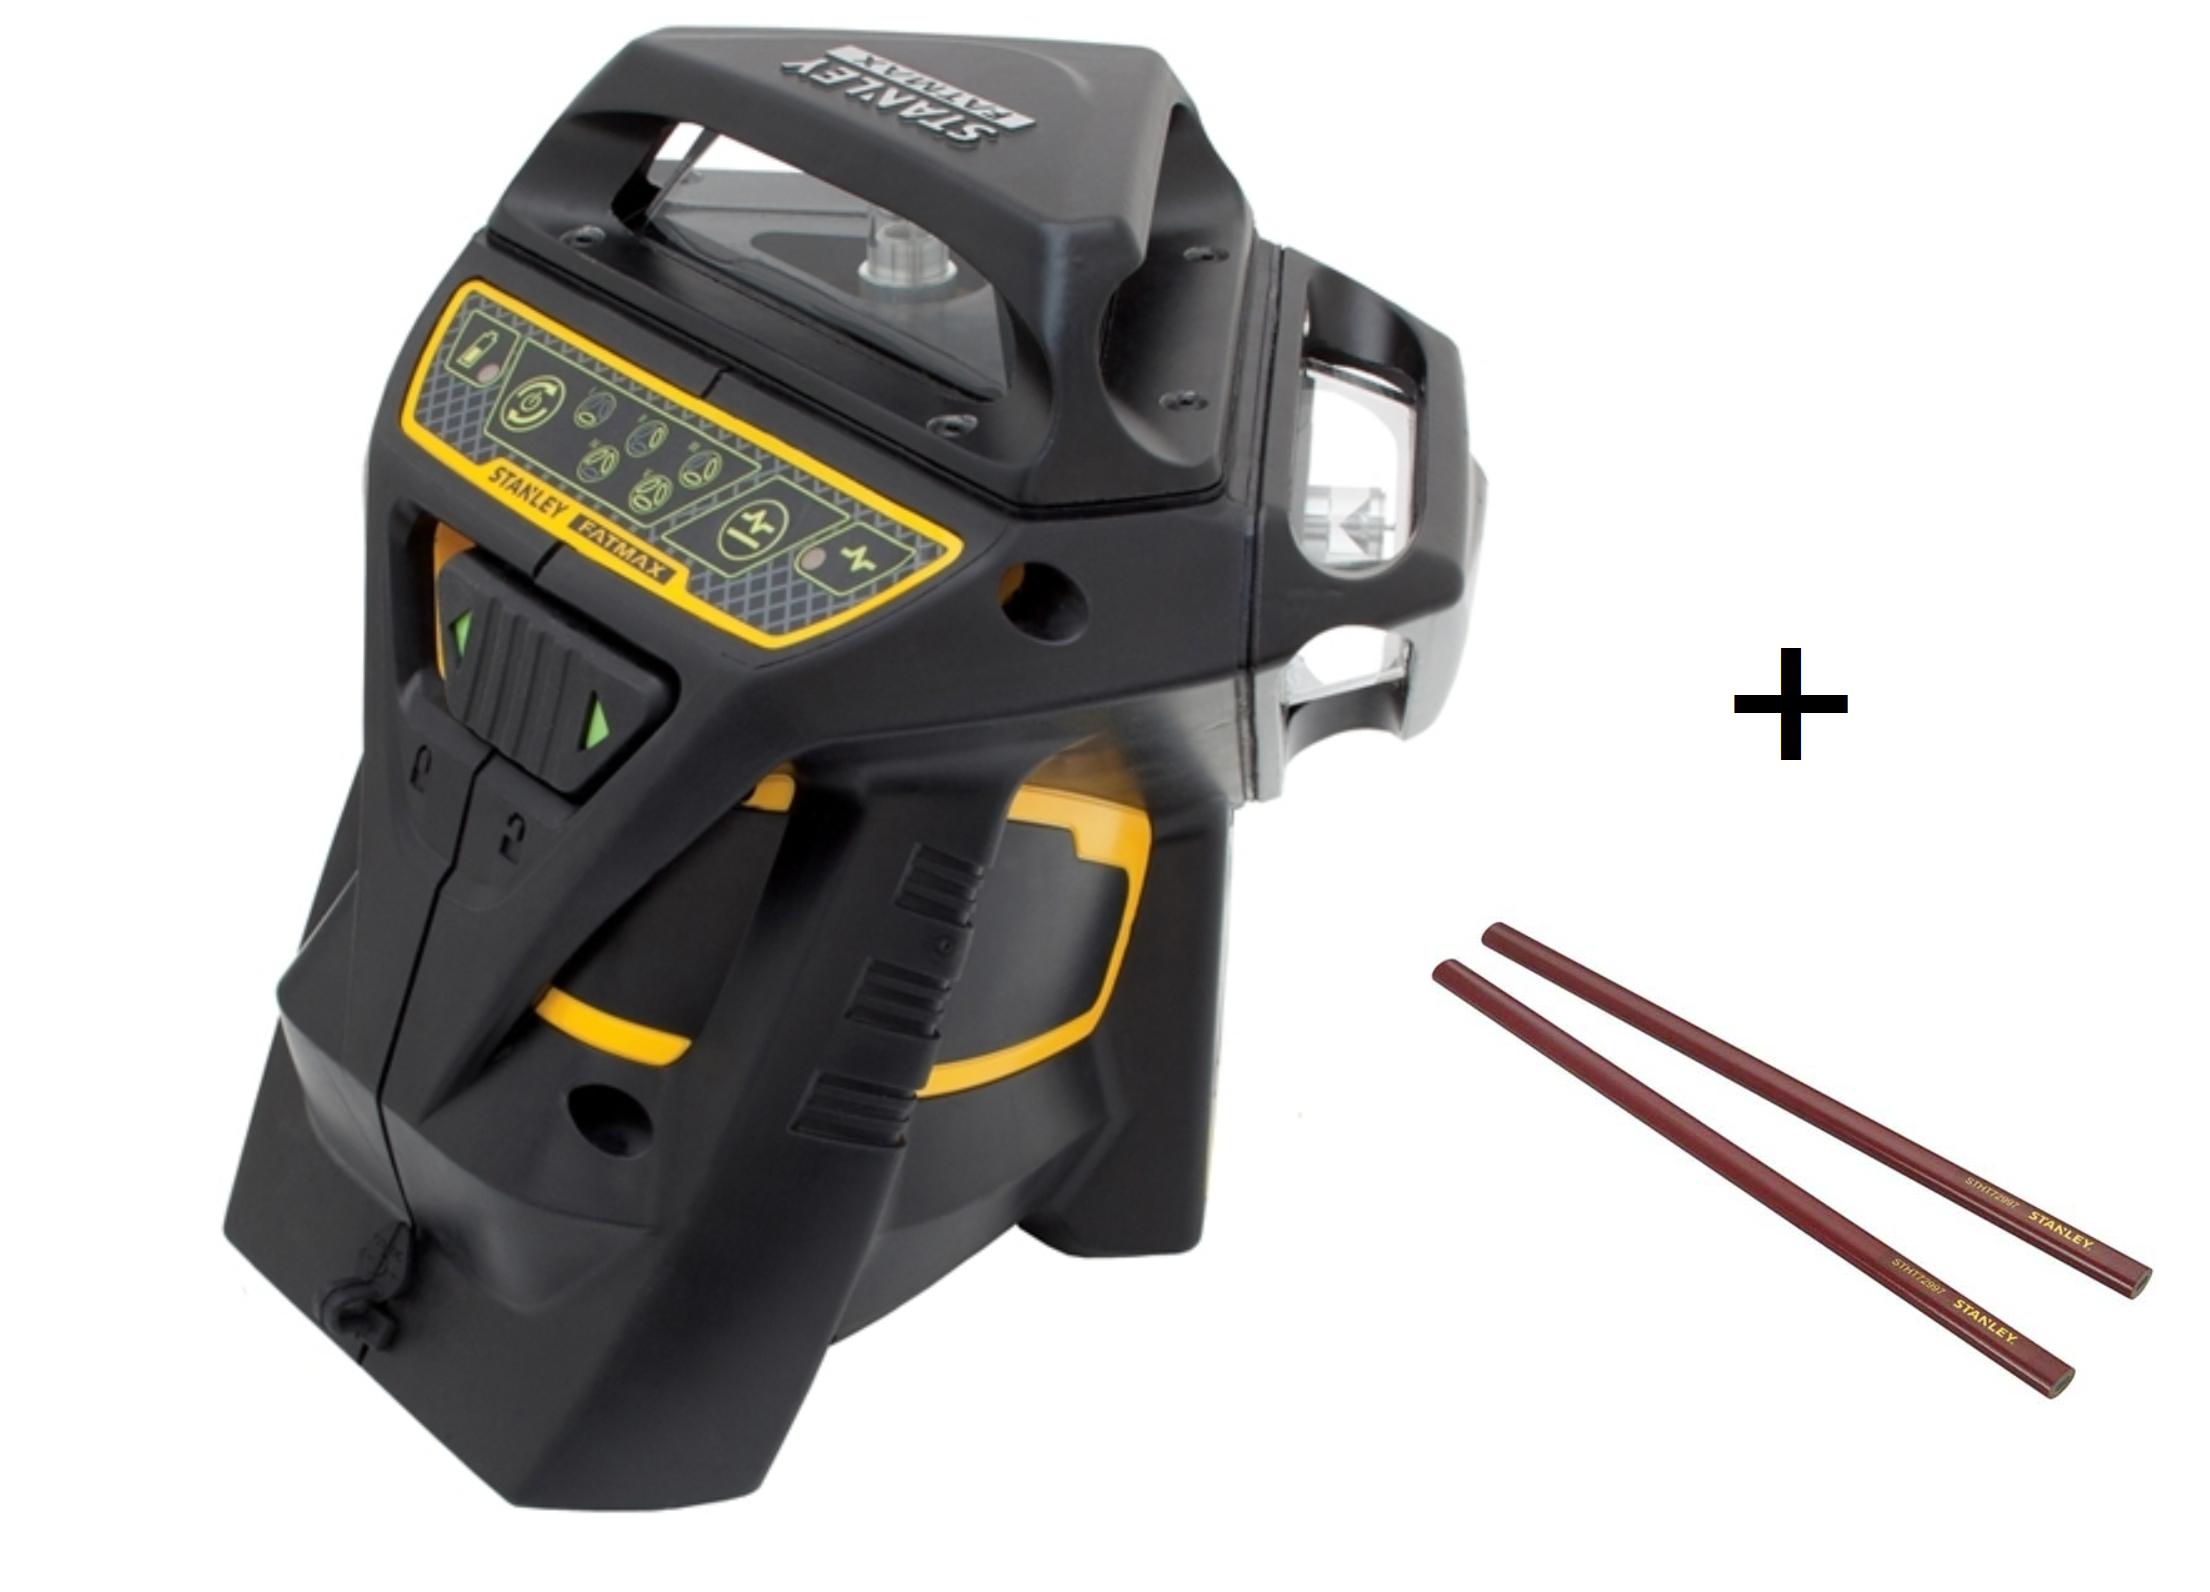 Niveau laser multilignes vert STANLEY X3G-360° - 6 lignes + crayon charpentier (Carte Total de 105€ offerte via ODR)